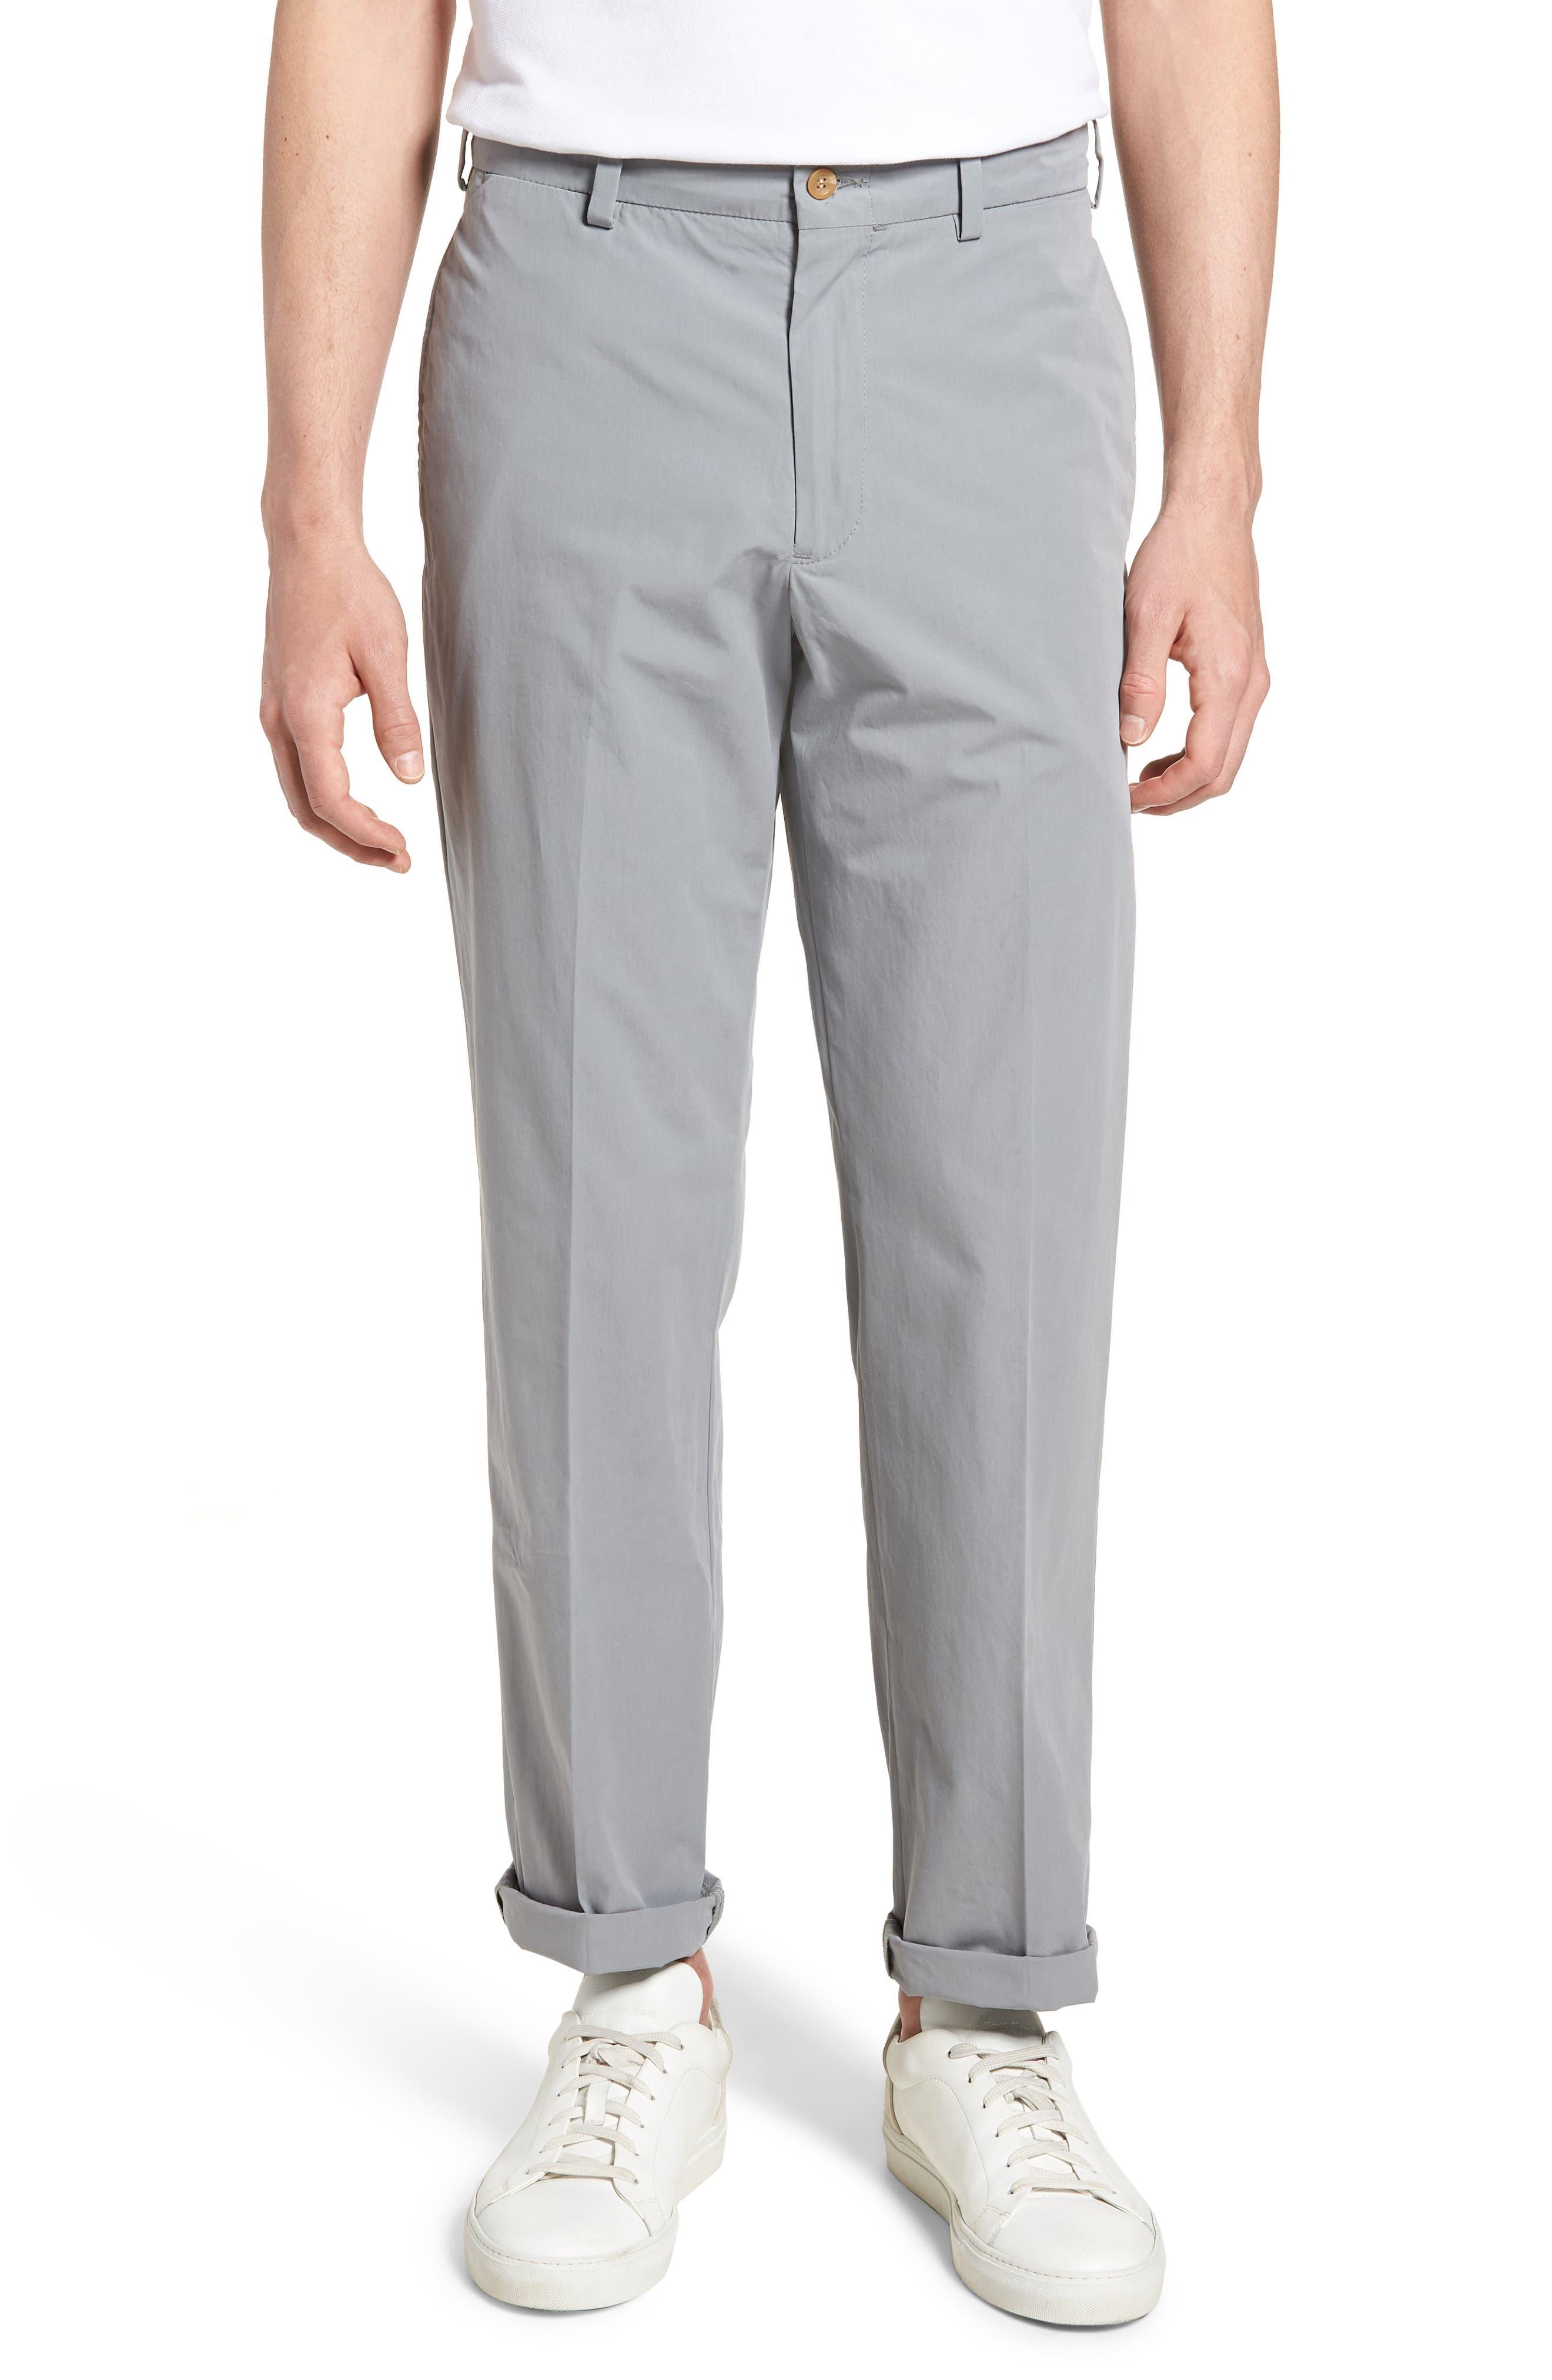 M2 Classic Fit Flat Front Tropical Cotton Poplin Pants,                         Main,                         color, Nickel